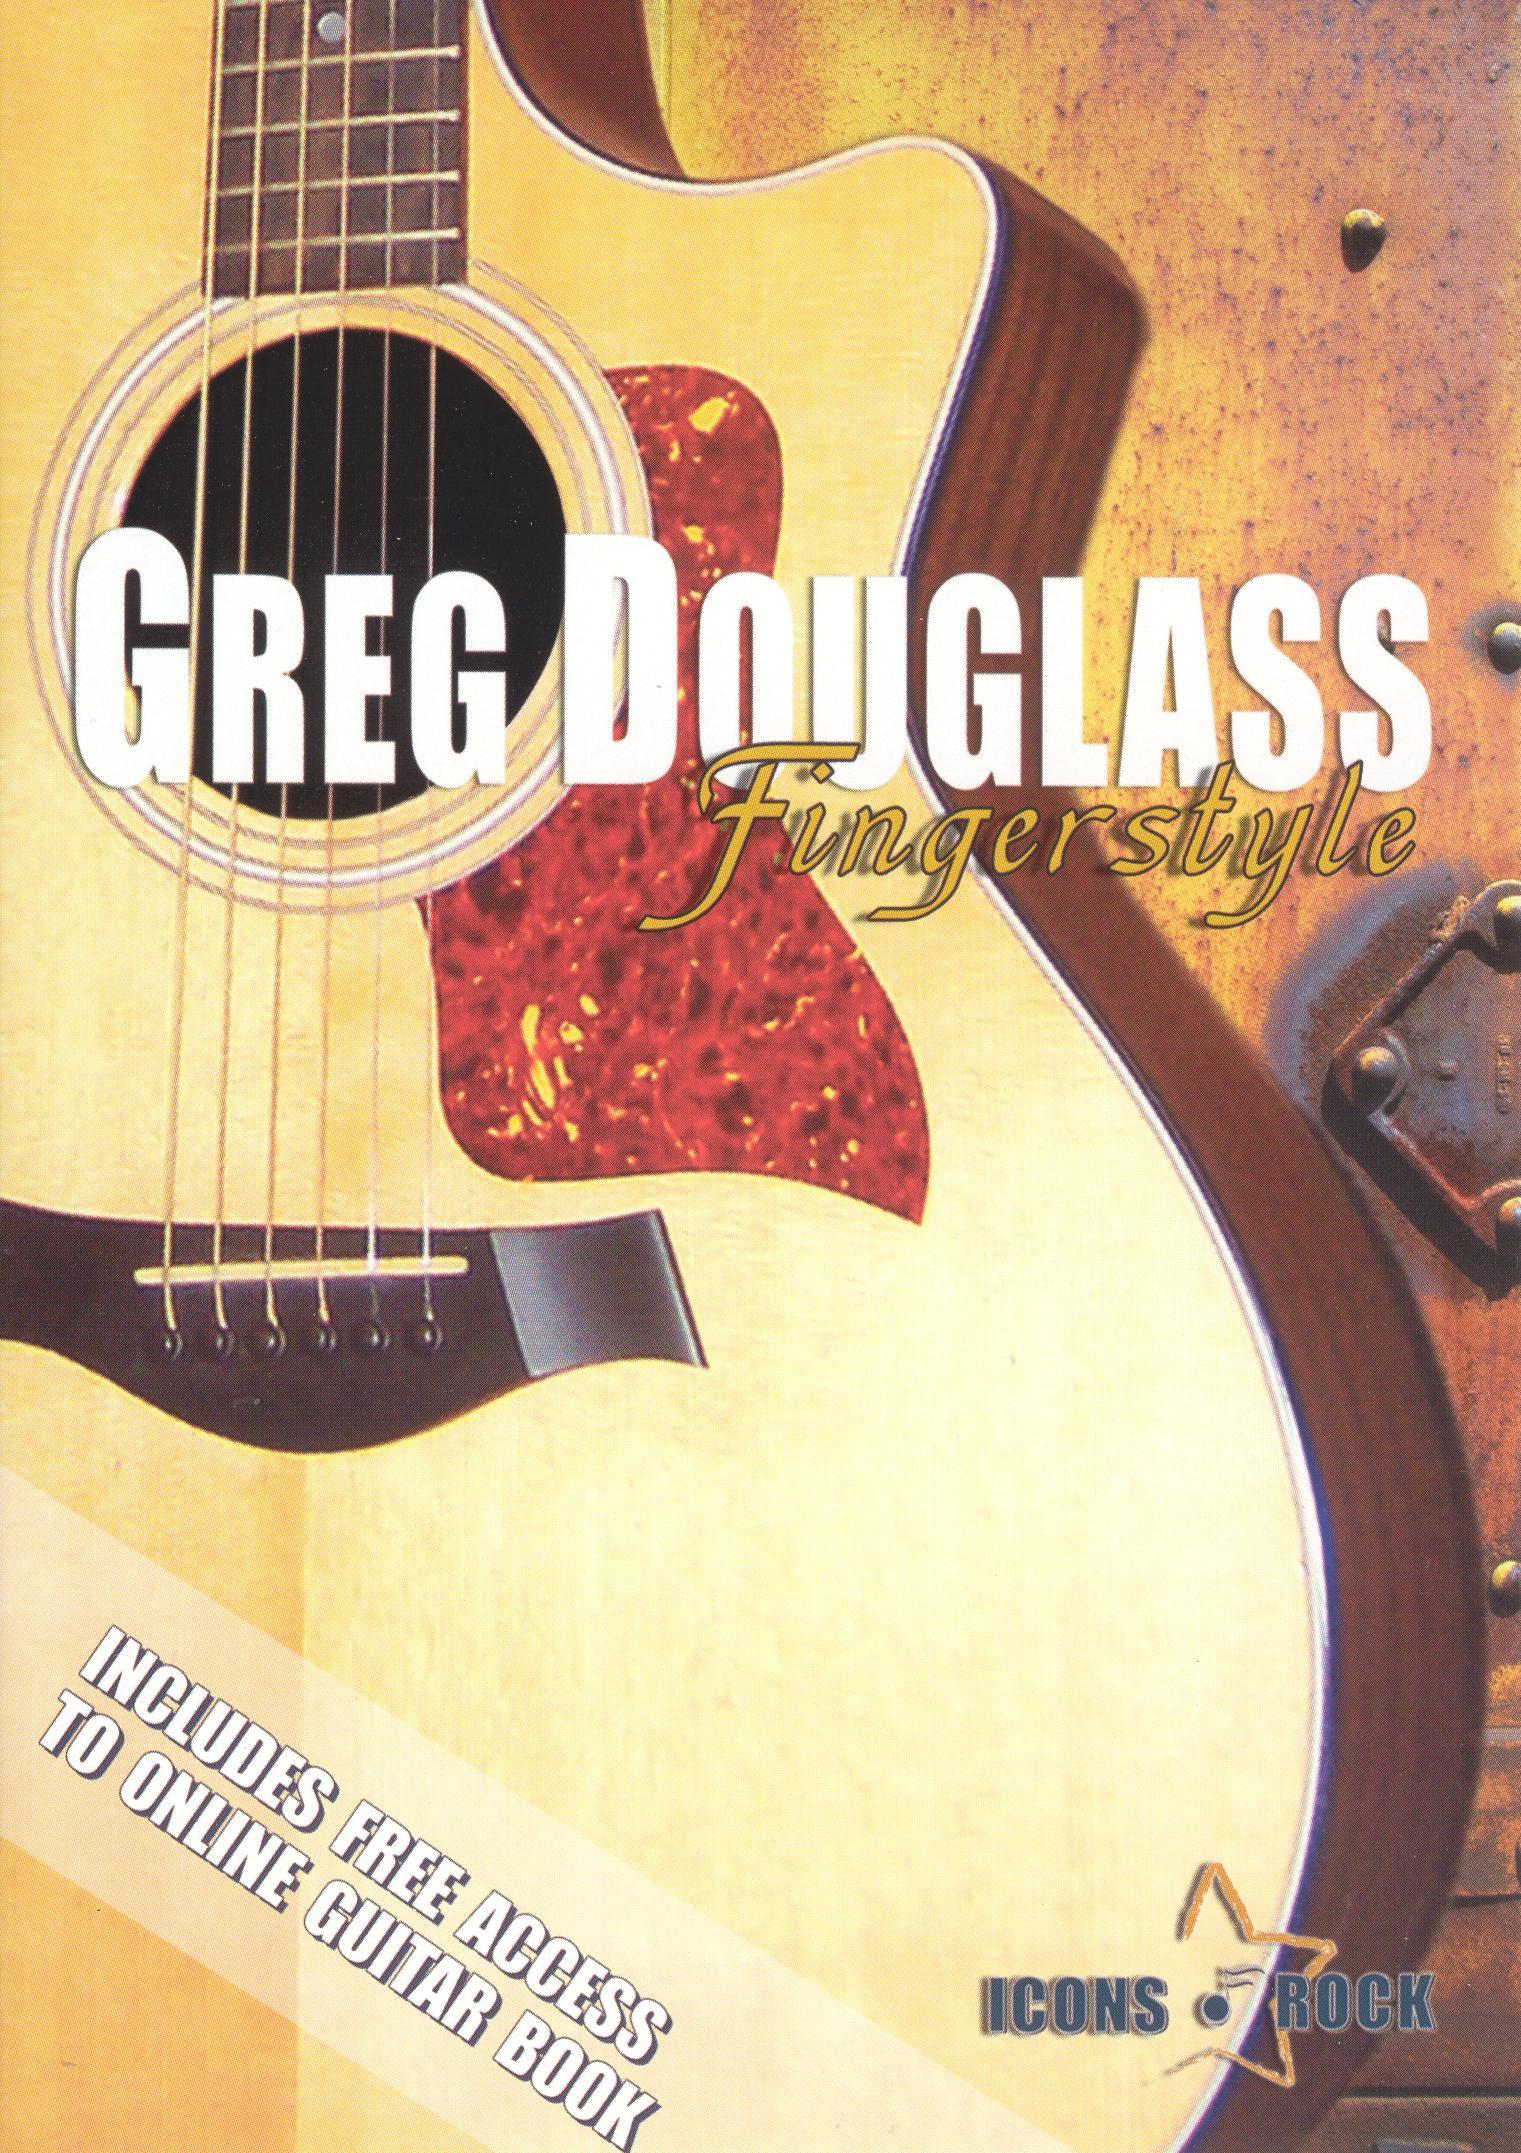 Greg Douglass: Fingerstyle